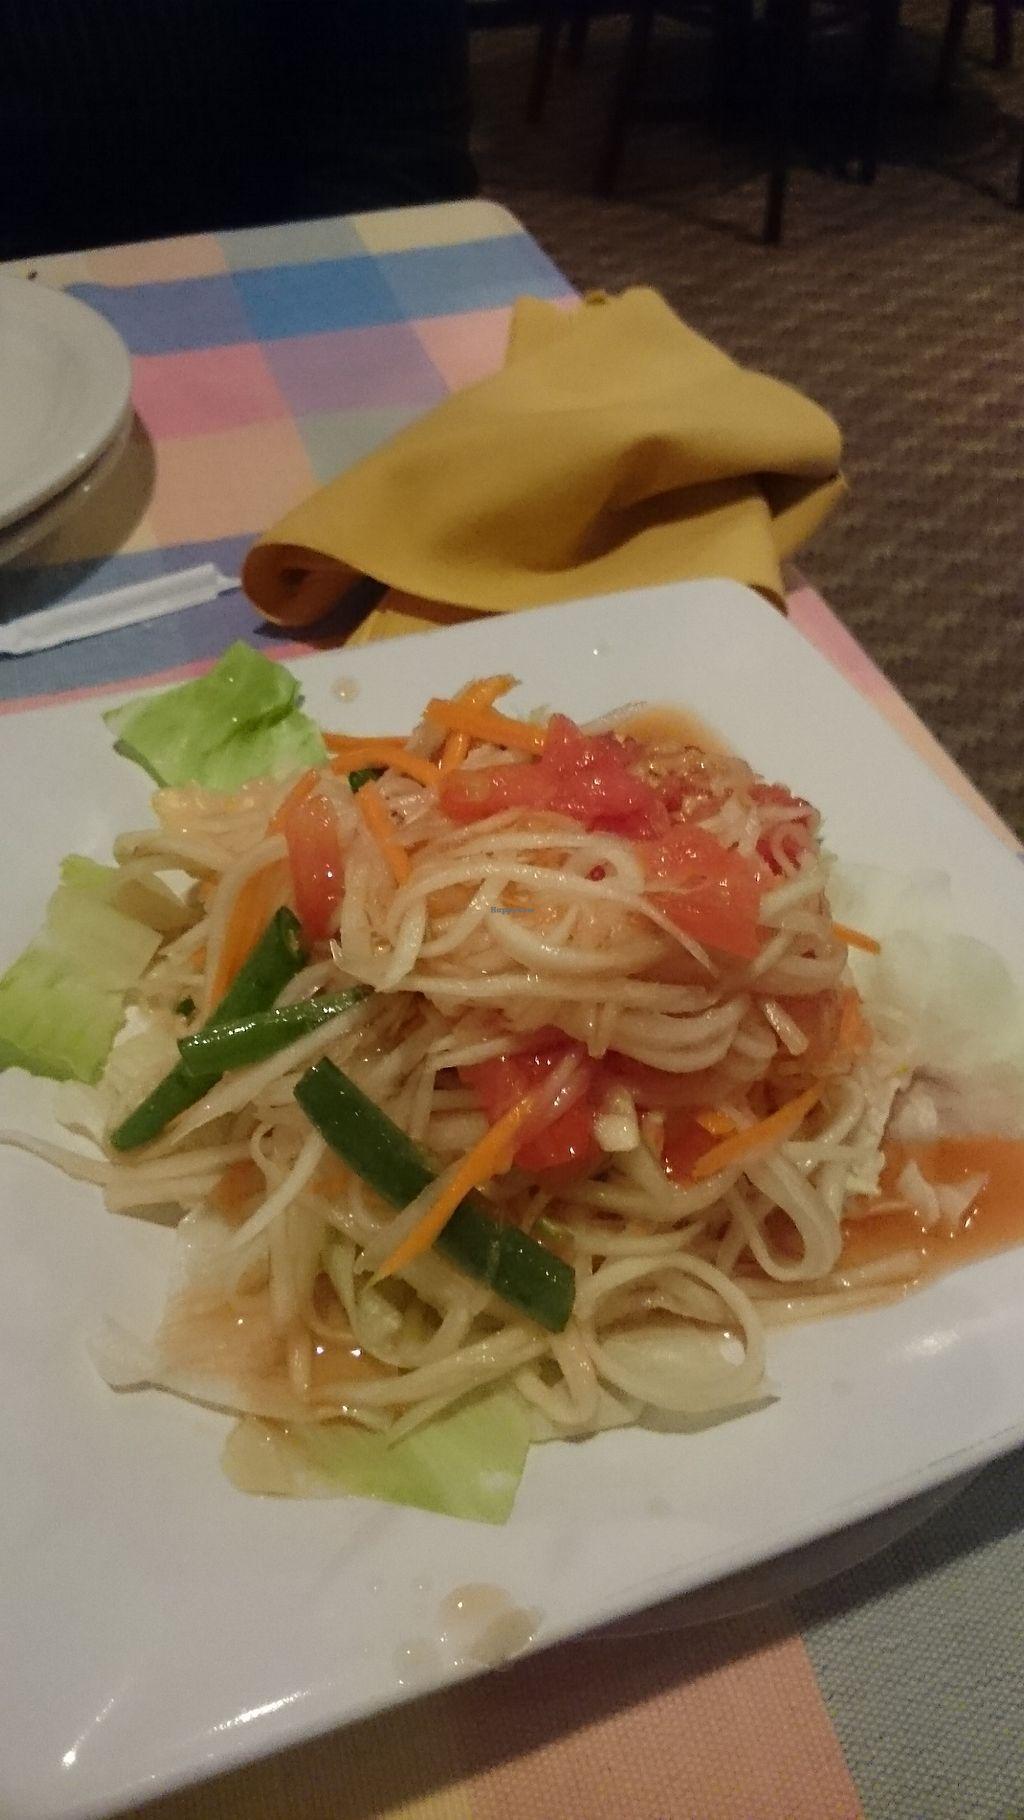 "Photo of The Bangkok House  by <a href=""/members/profile/ZoraySpielvogel"">ZoraySpielvogel</a> <br/>Popya salad.  <br/> September 10, 2017  - <a href='/contact/abuse/image/100695/303041'>Report</a>"